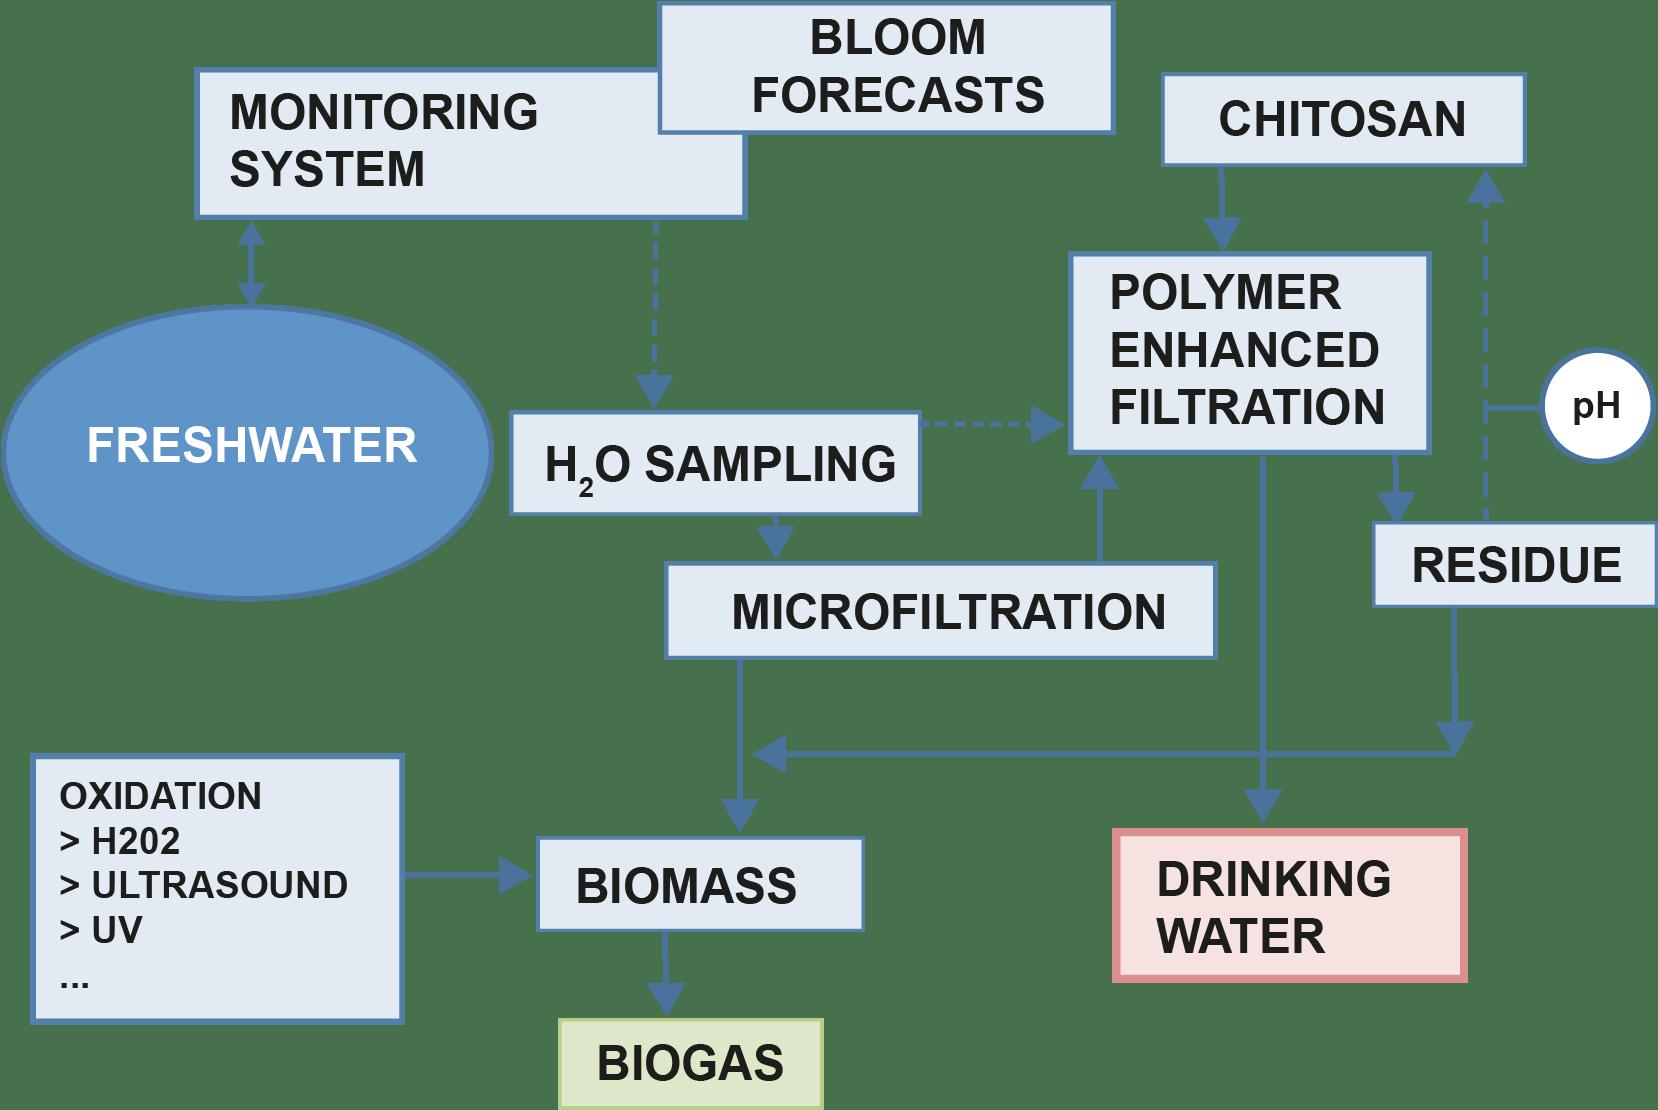 the monitoring/treatment process scheme